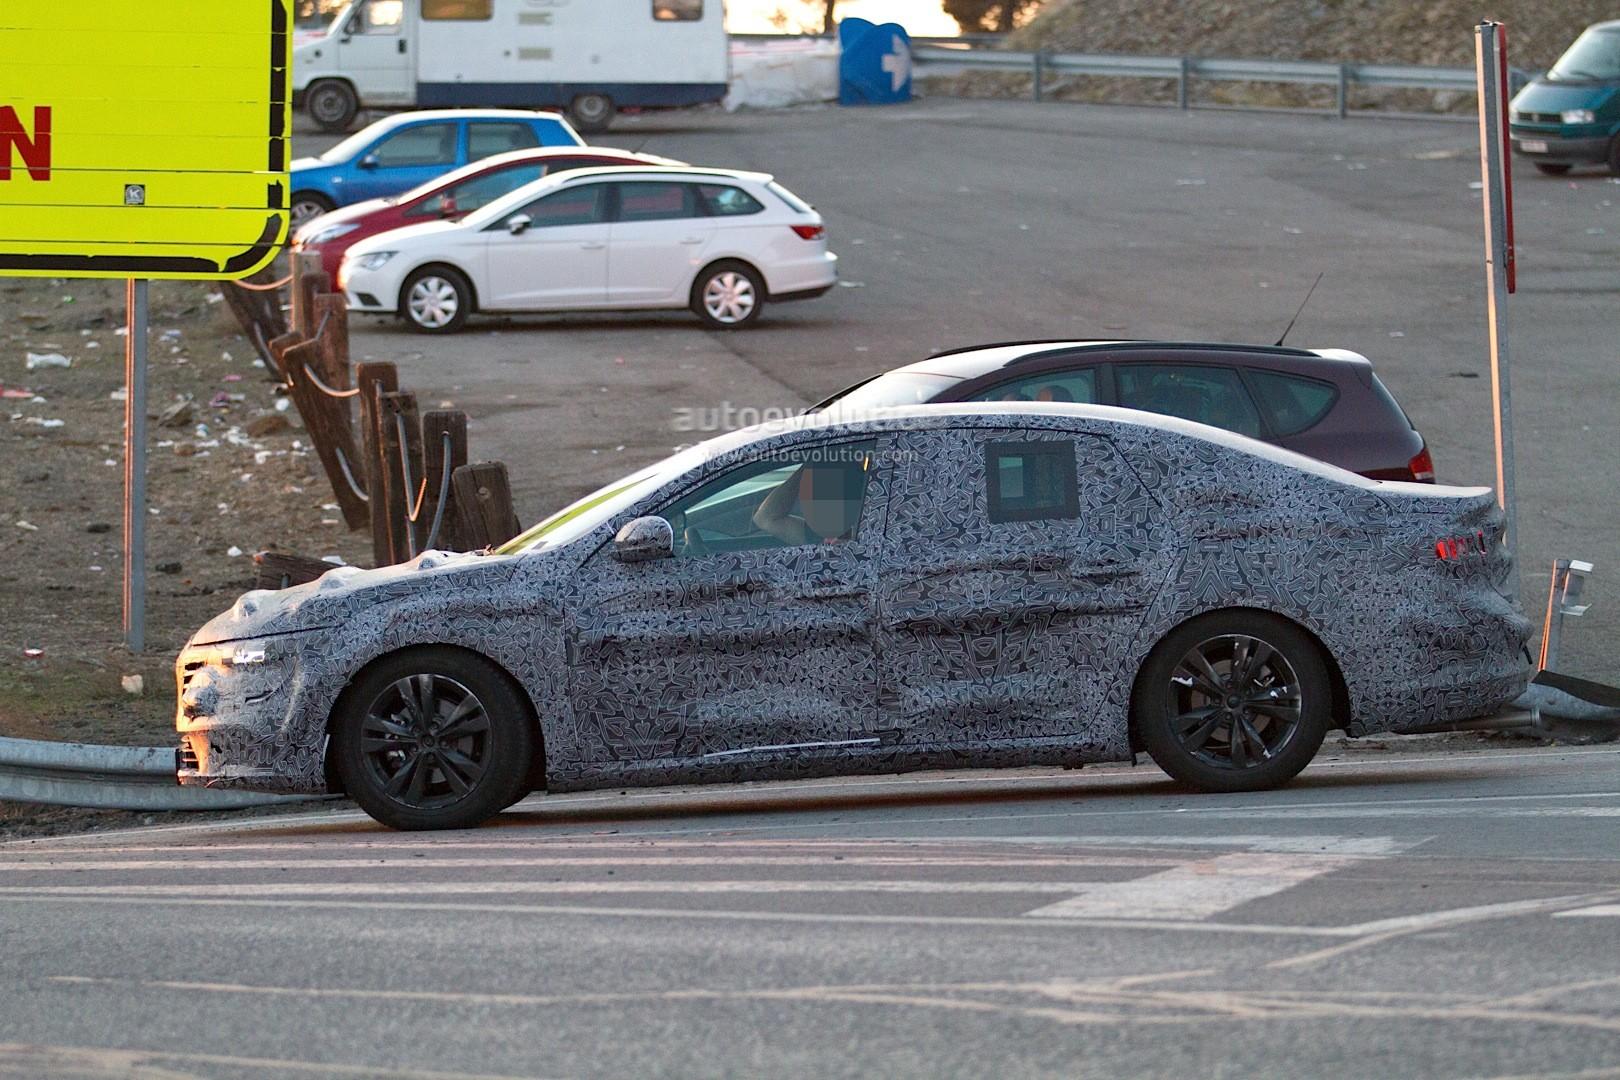 new renault laguna flagship sedan spied again could debut later in 2015 autoevolution. Black Bedroom Furniture Sets. Home Design Ideas